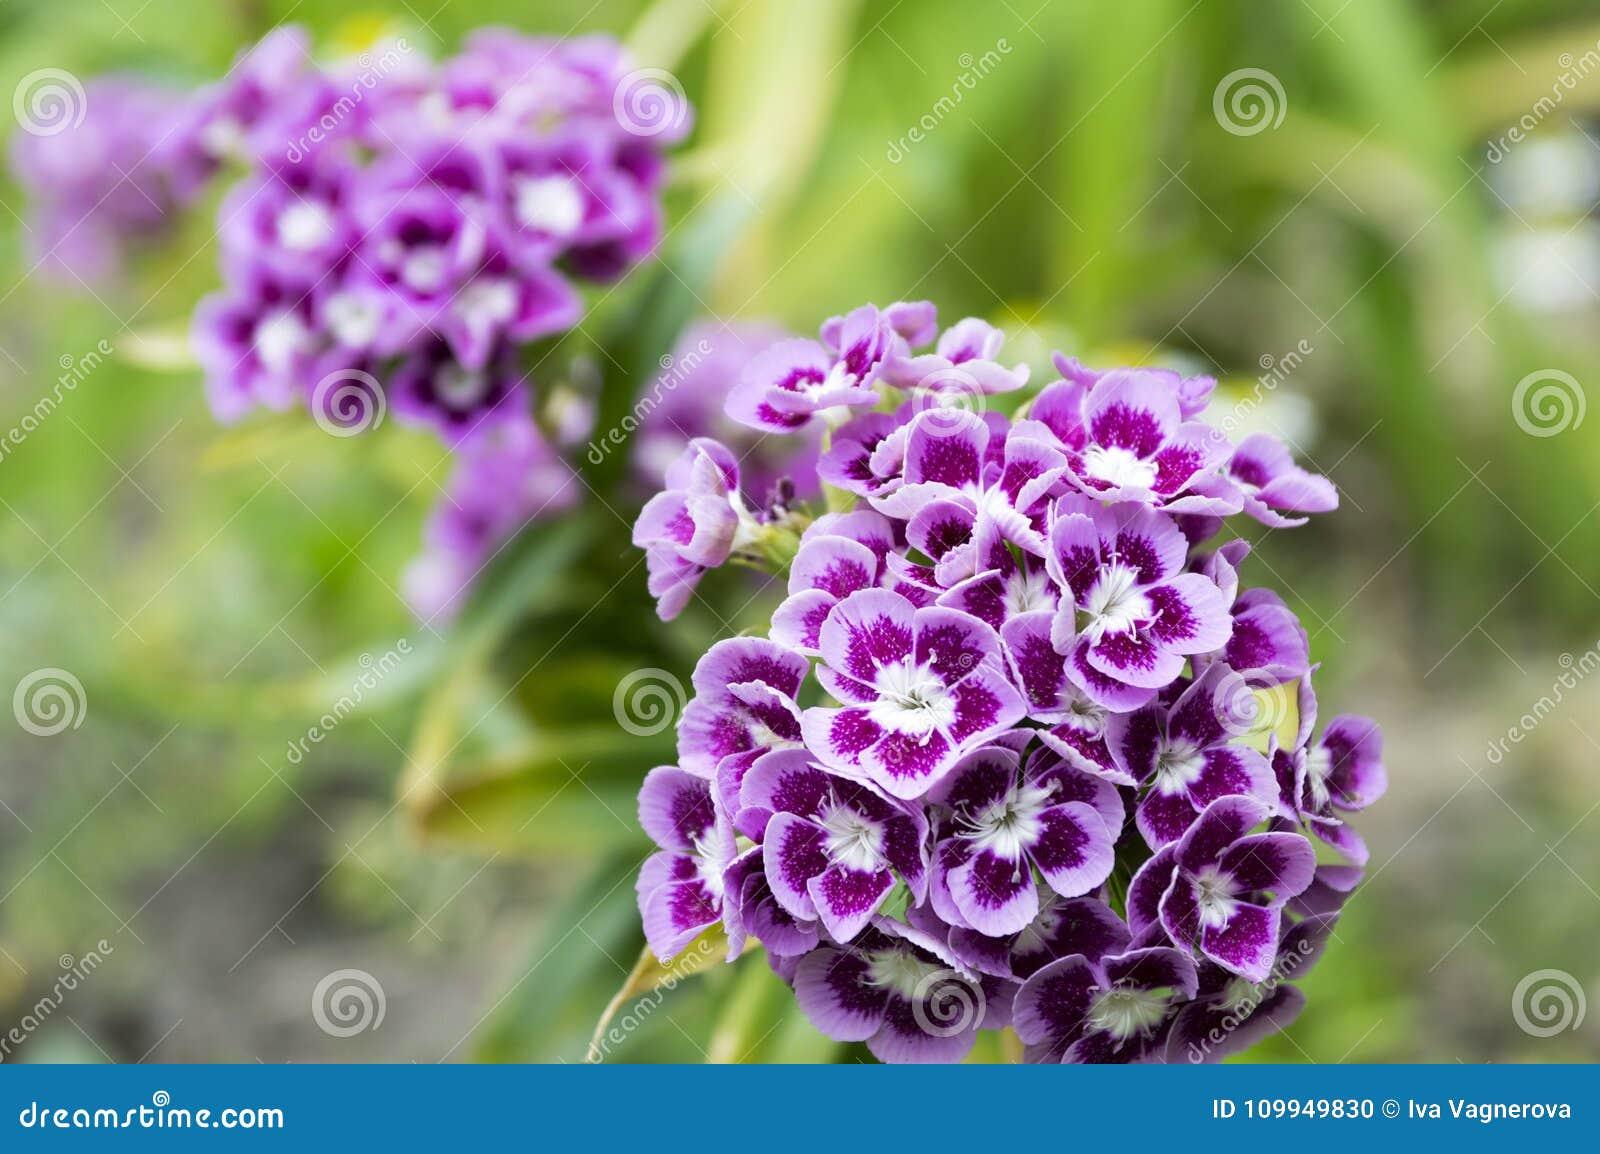 Dianthus Barbatus Summer Ornamental Flowers In Bloom Stock Photo